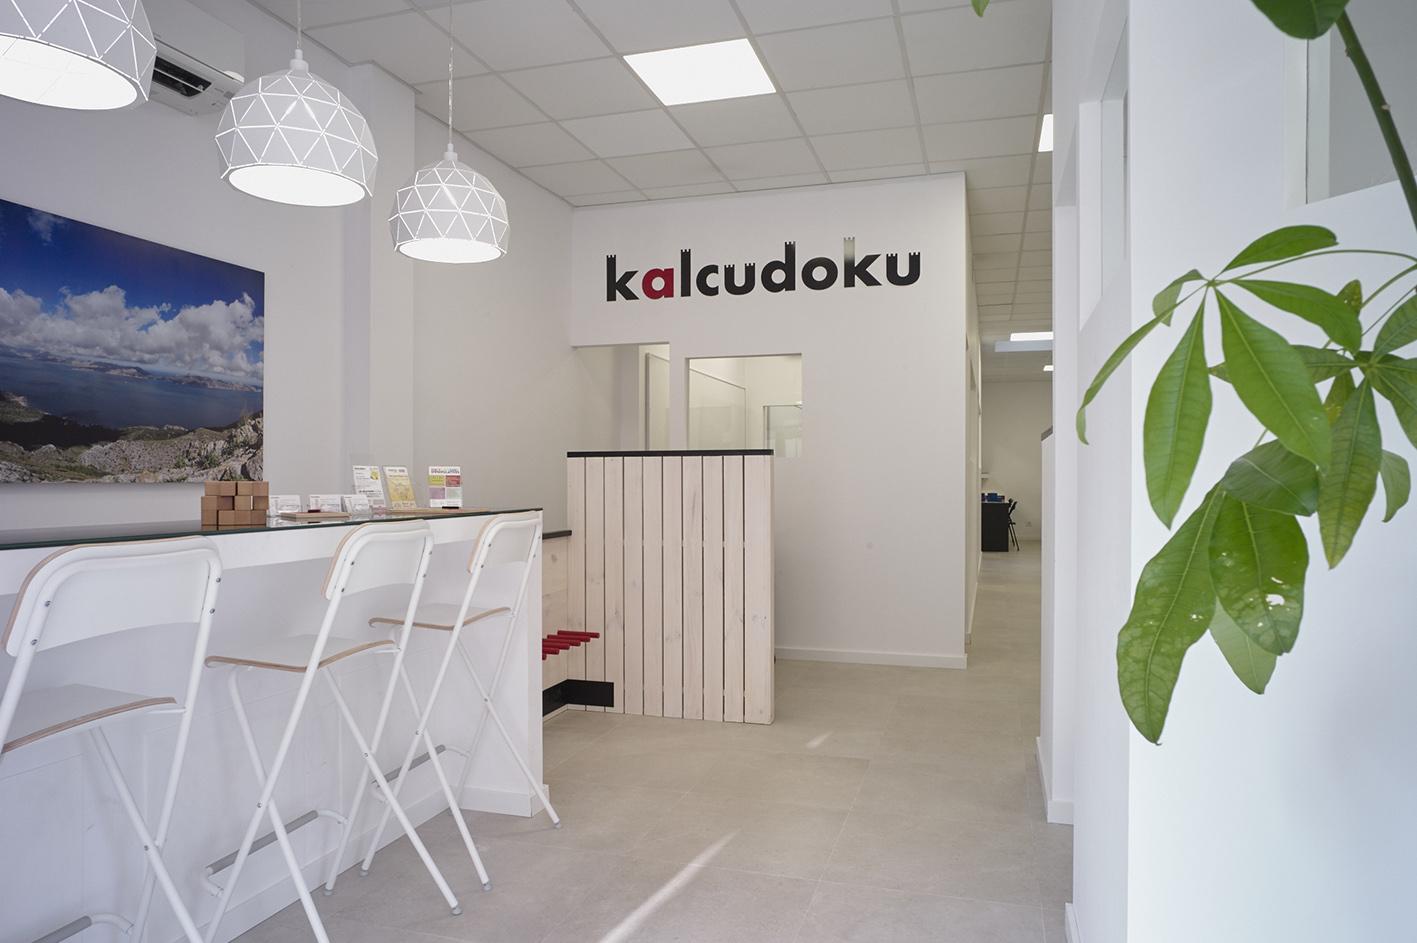 KALCUDOKU_L1000331.jpg